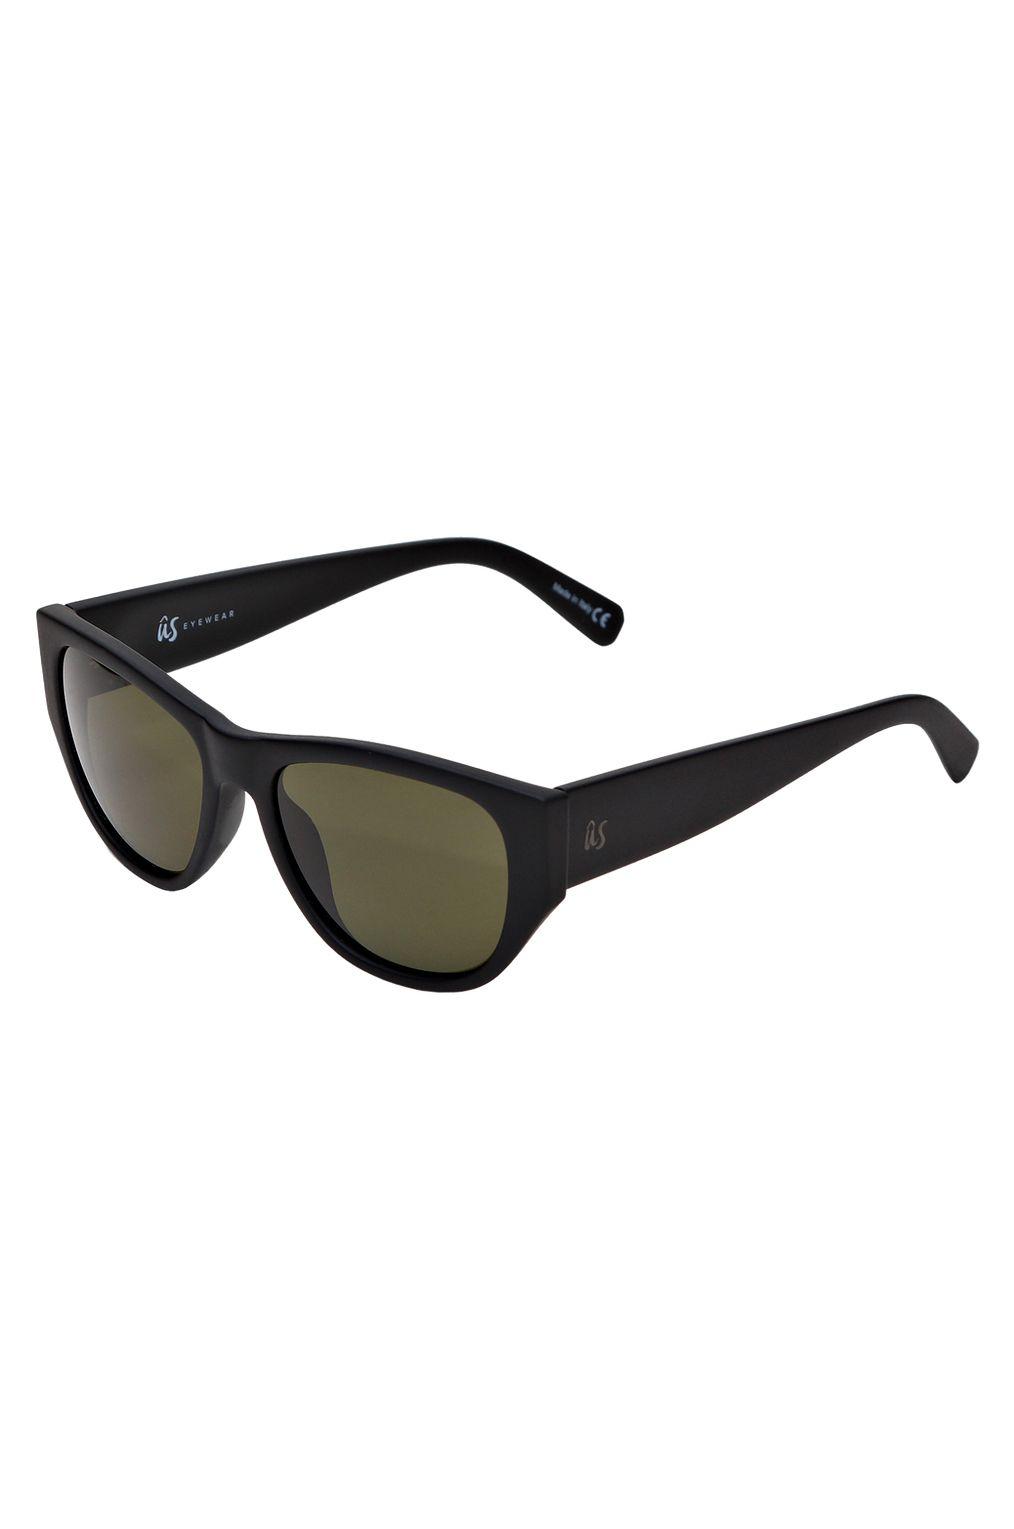 US Sunglasses DIMAGGIOS Matte Black/Vintage Grey Polarized